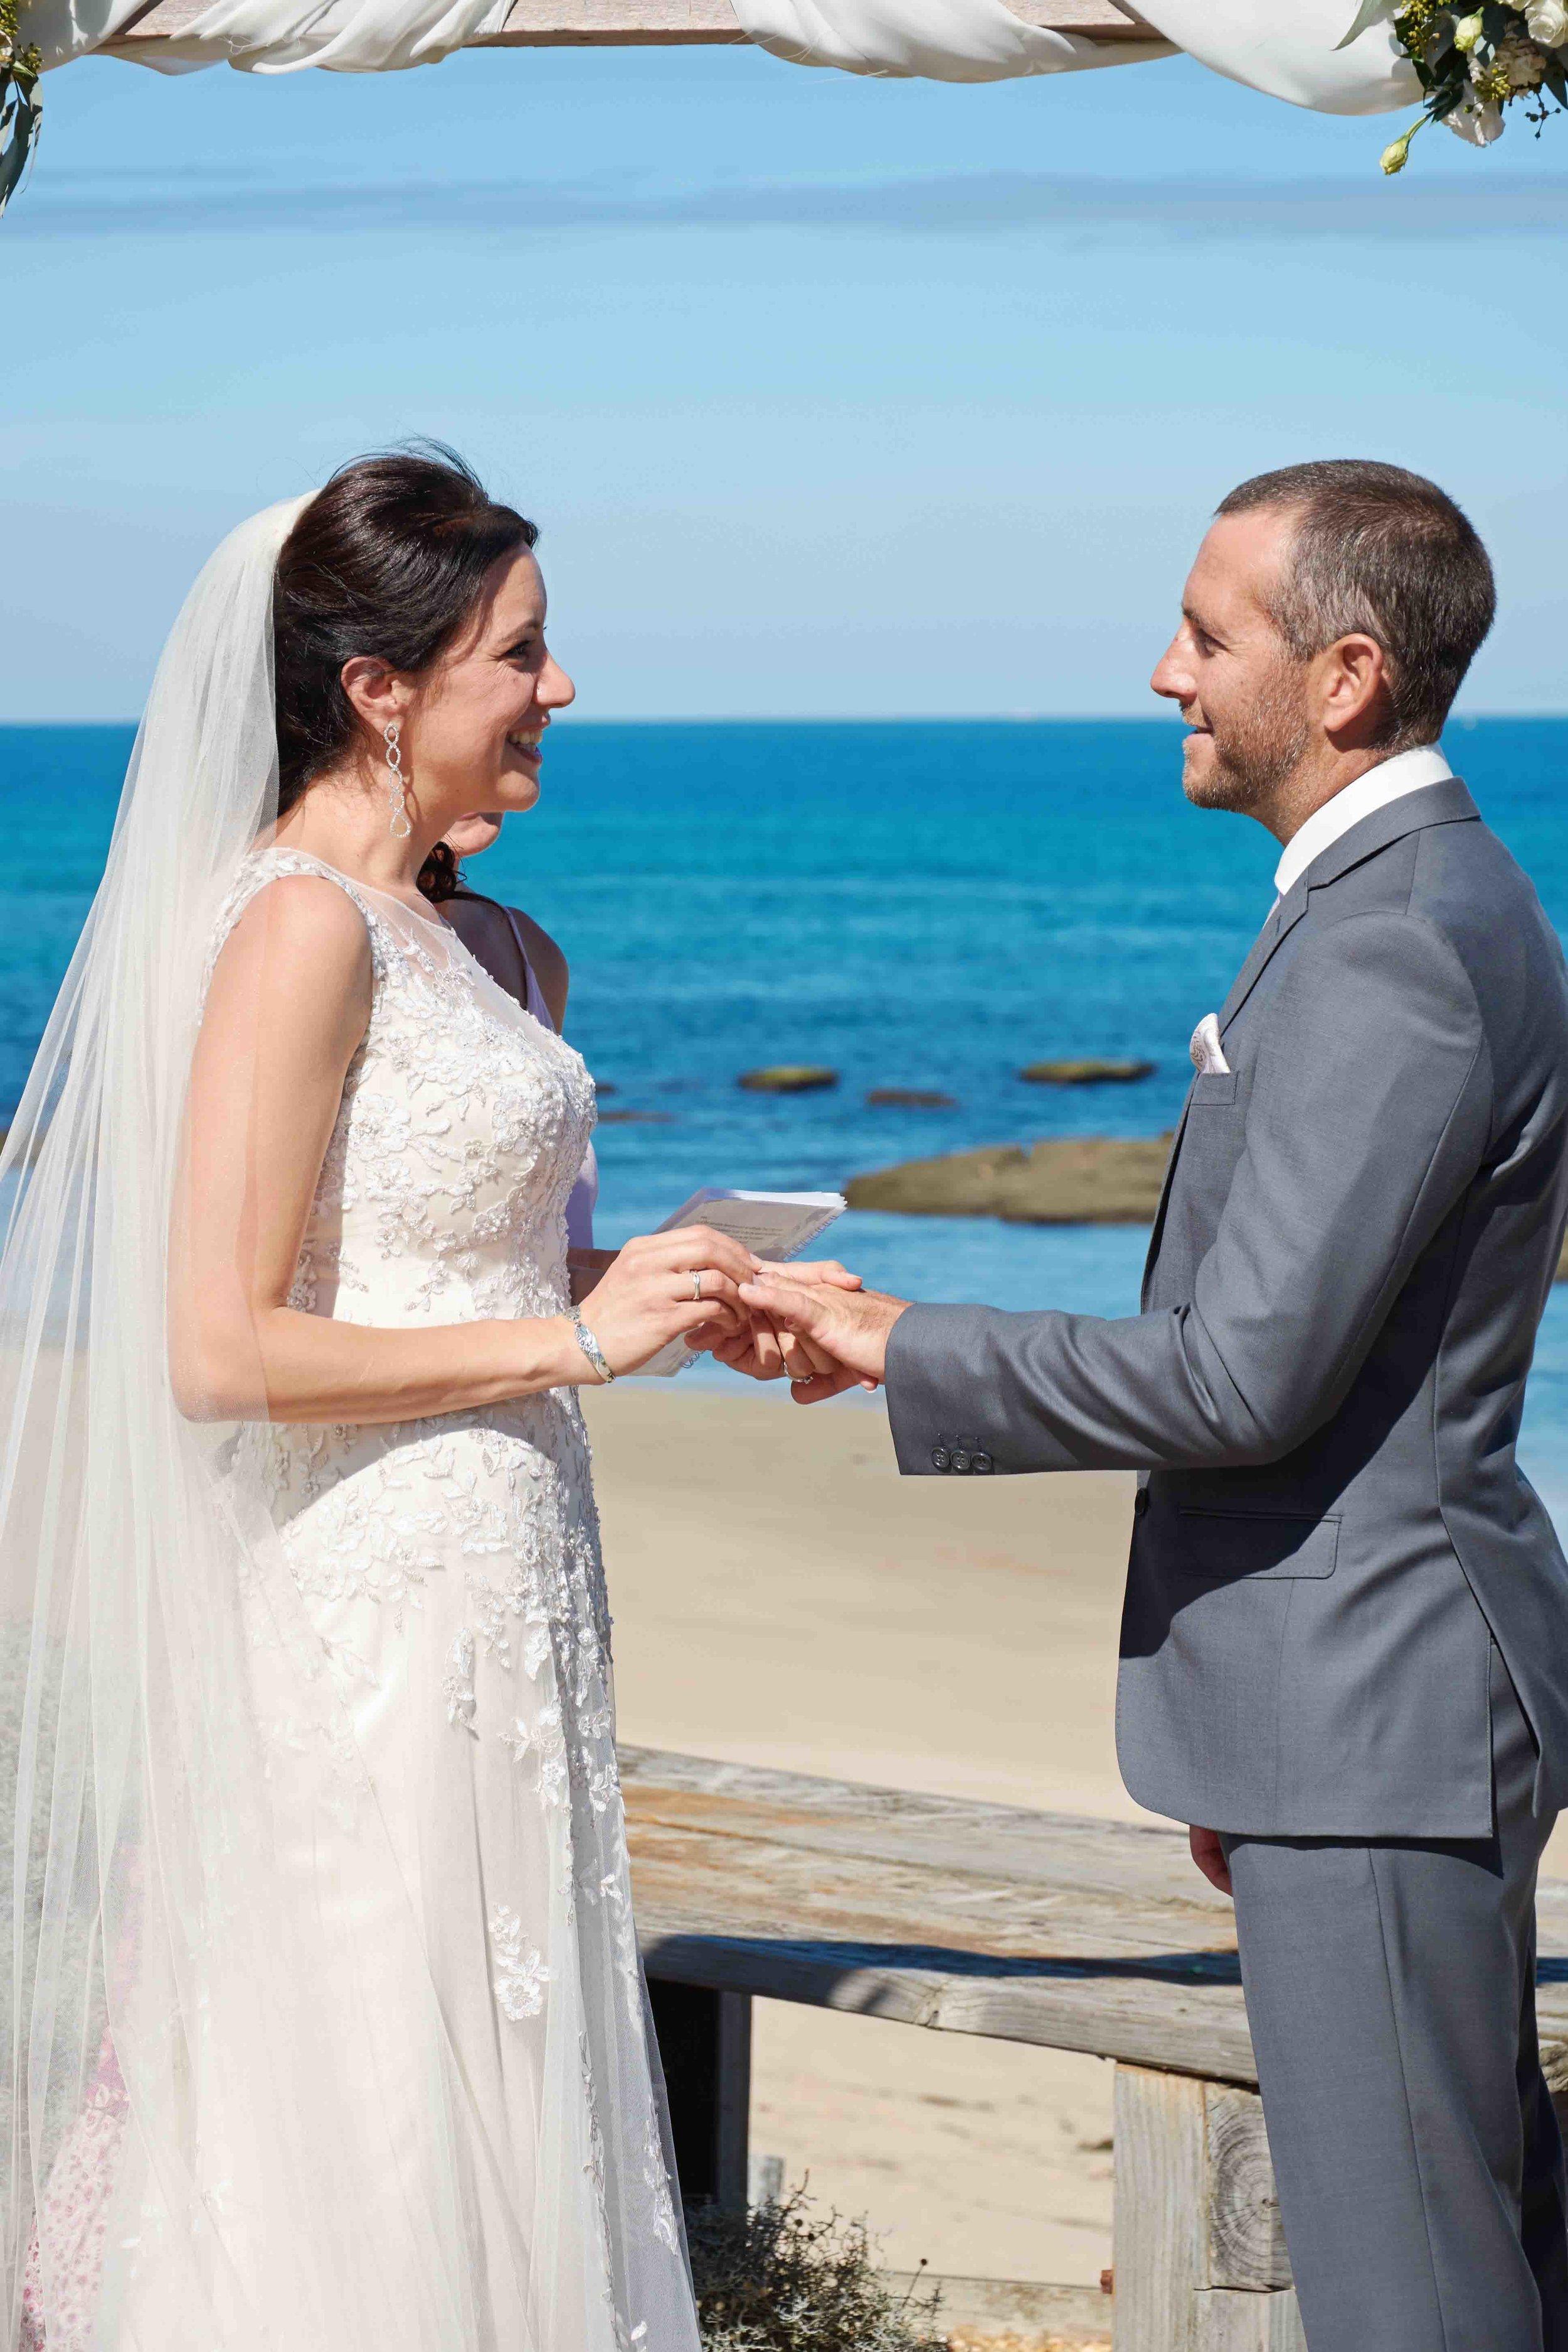 sorrento-wedding-photography-all-smiles-marissa-jade-photography-53.jpg